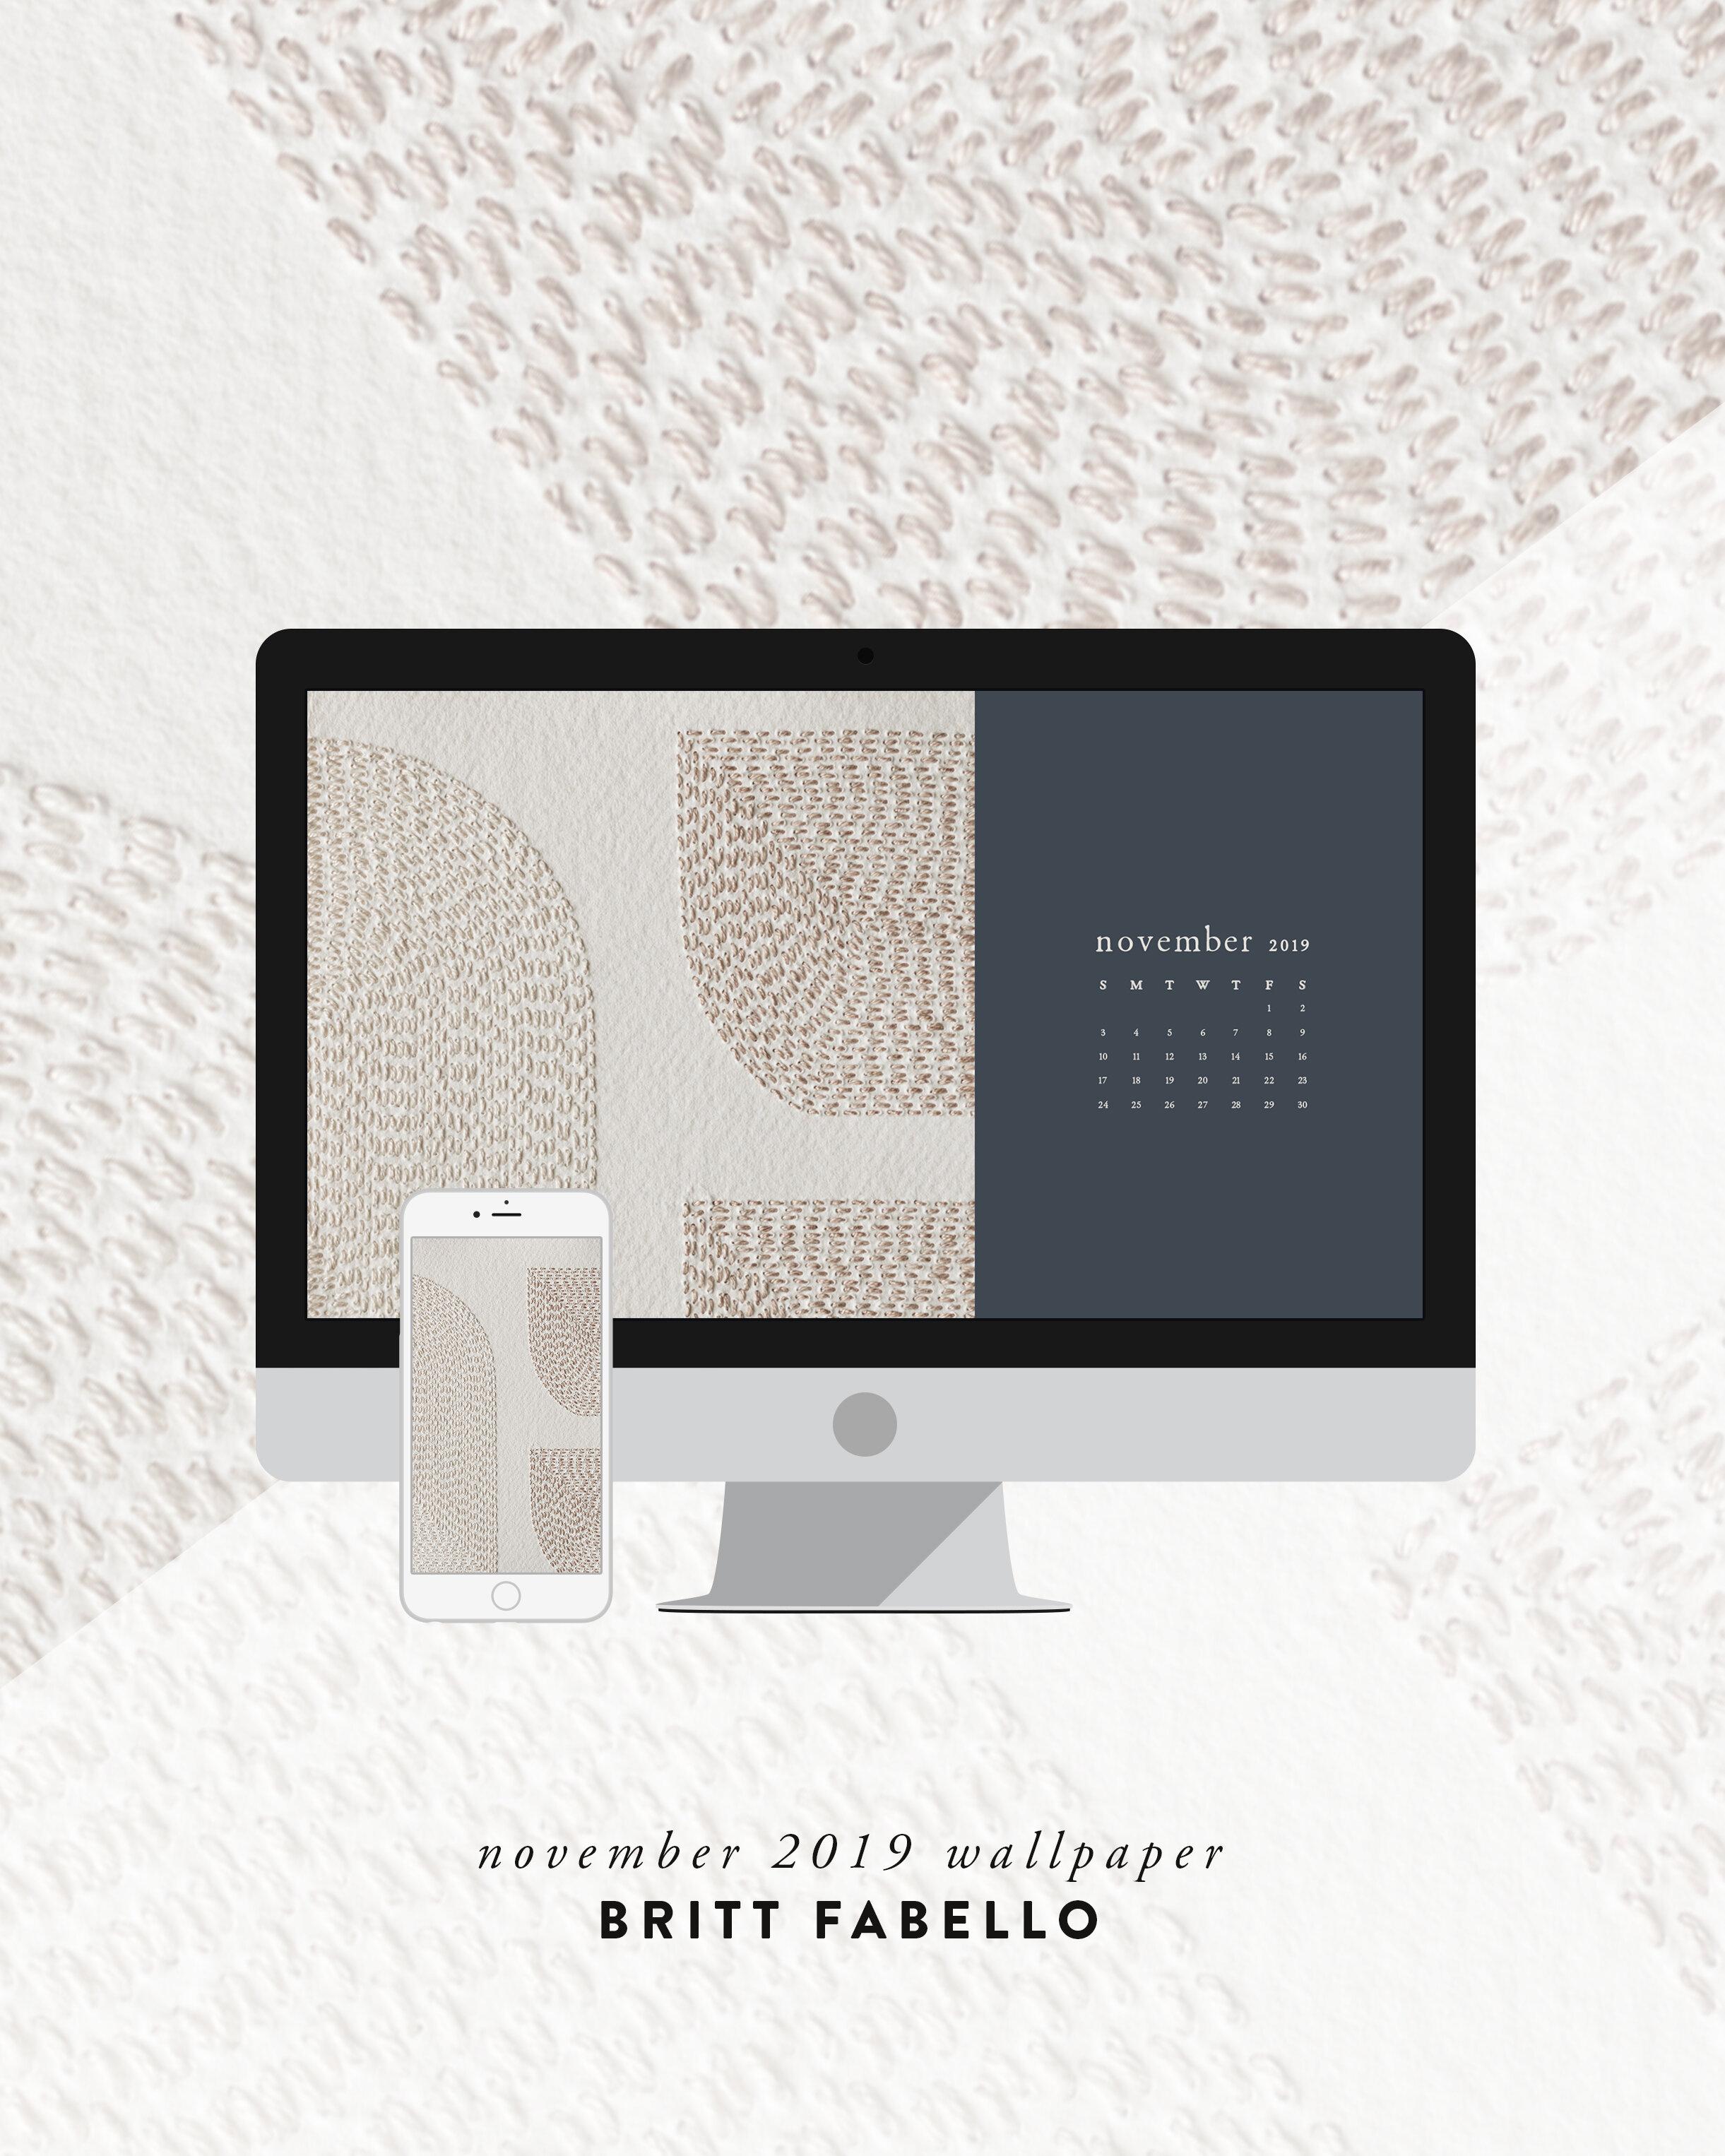 Wallpaper: November 2019 Calendar & Artwork | Computer & Phone | Britt Fabello